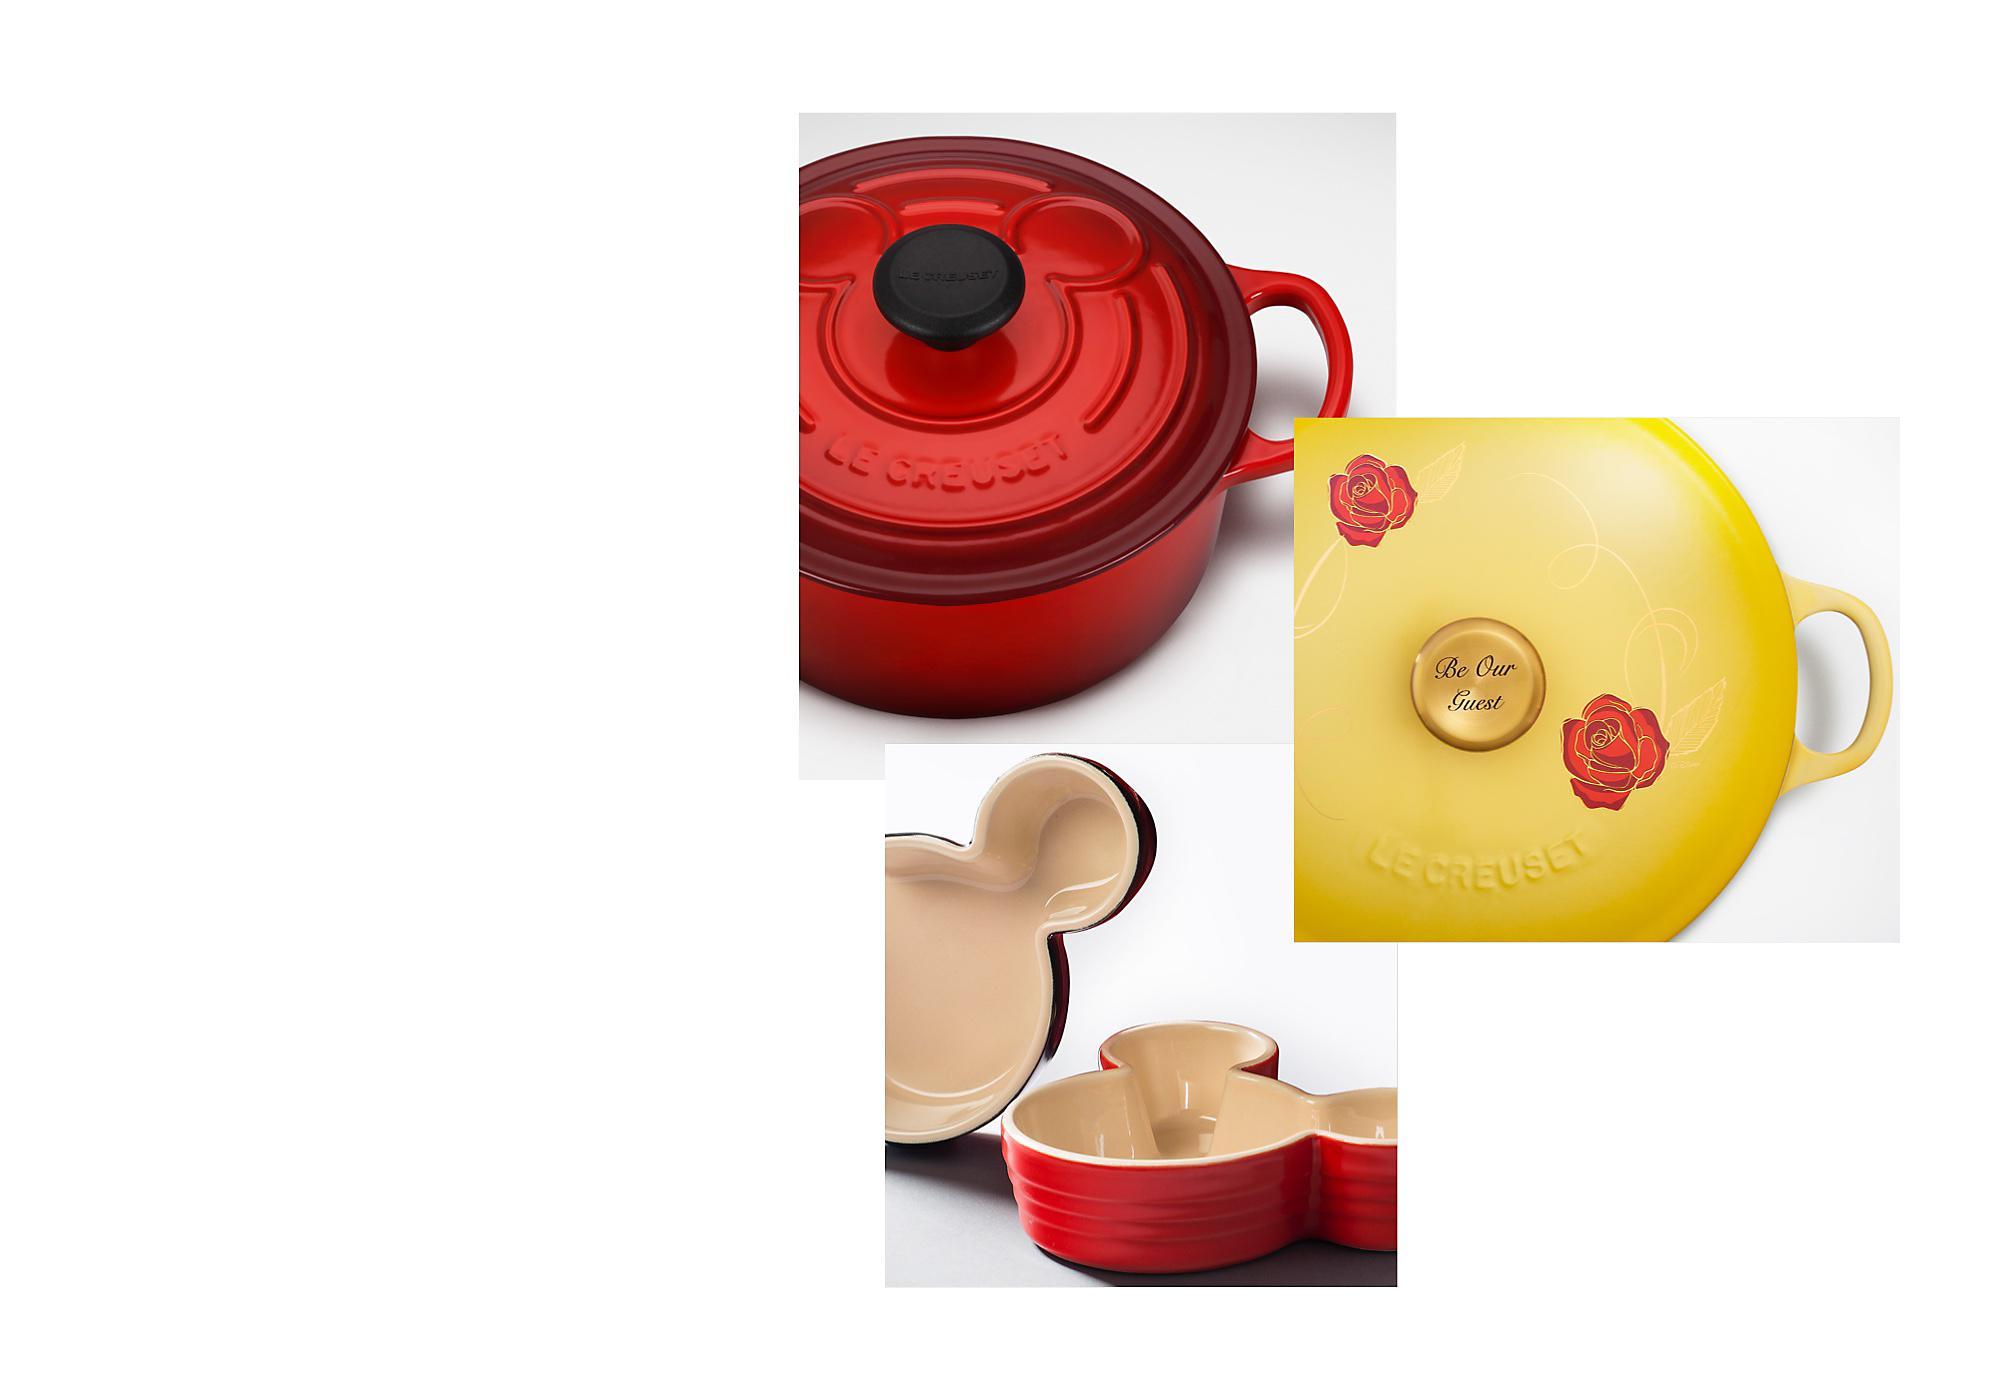 Batterie di pentole insuperabili Le Creuset produce utensili da cucina di qualità imbattibile da più di 100 anni